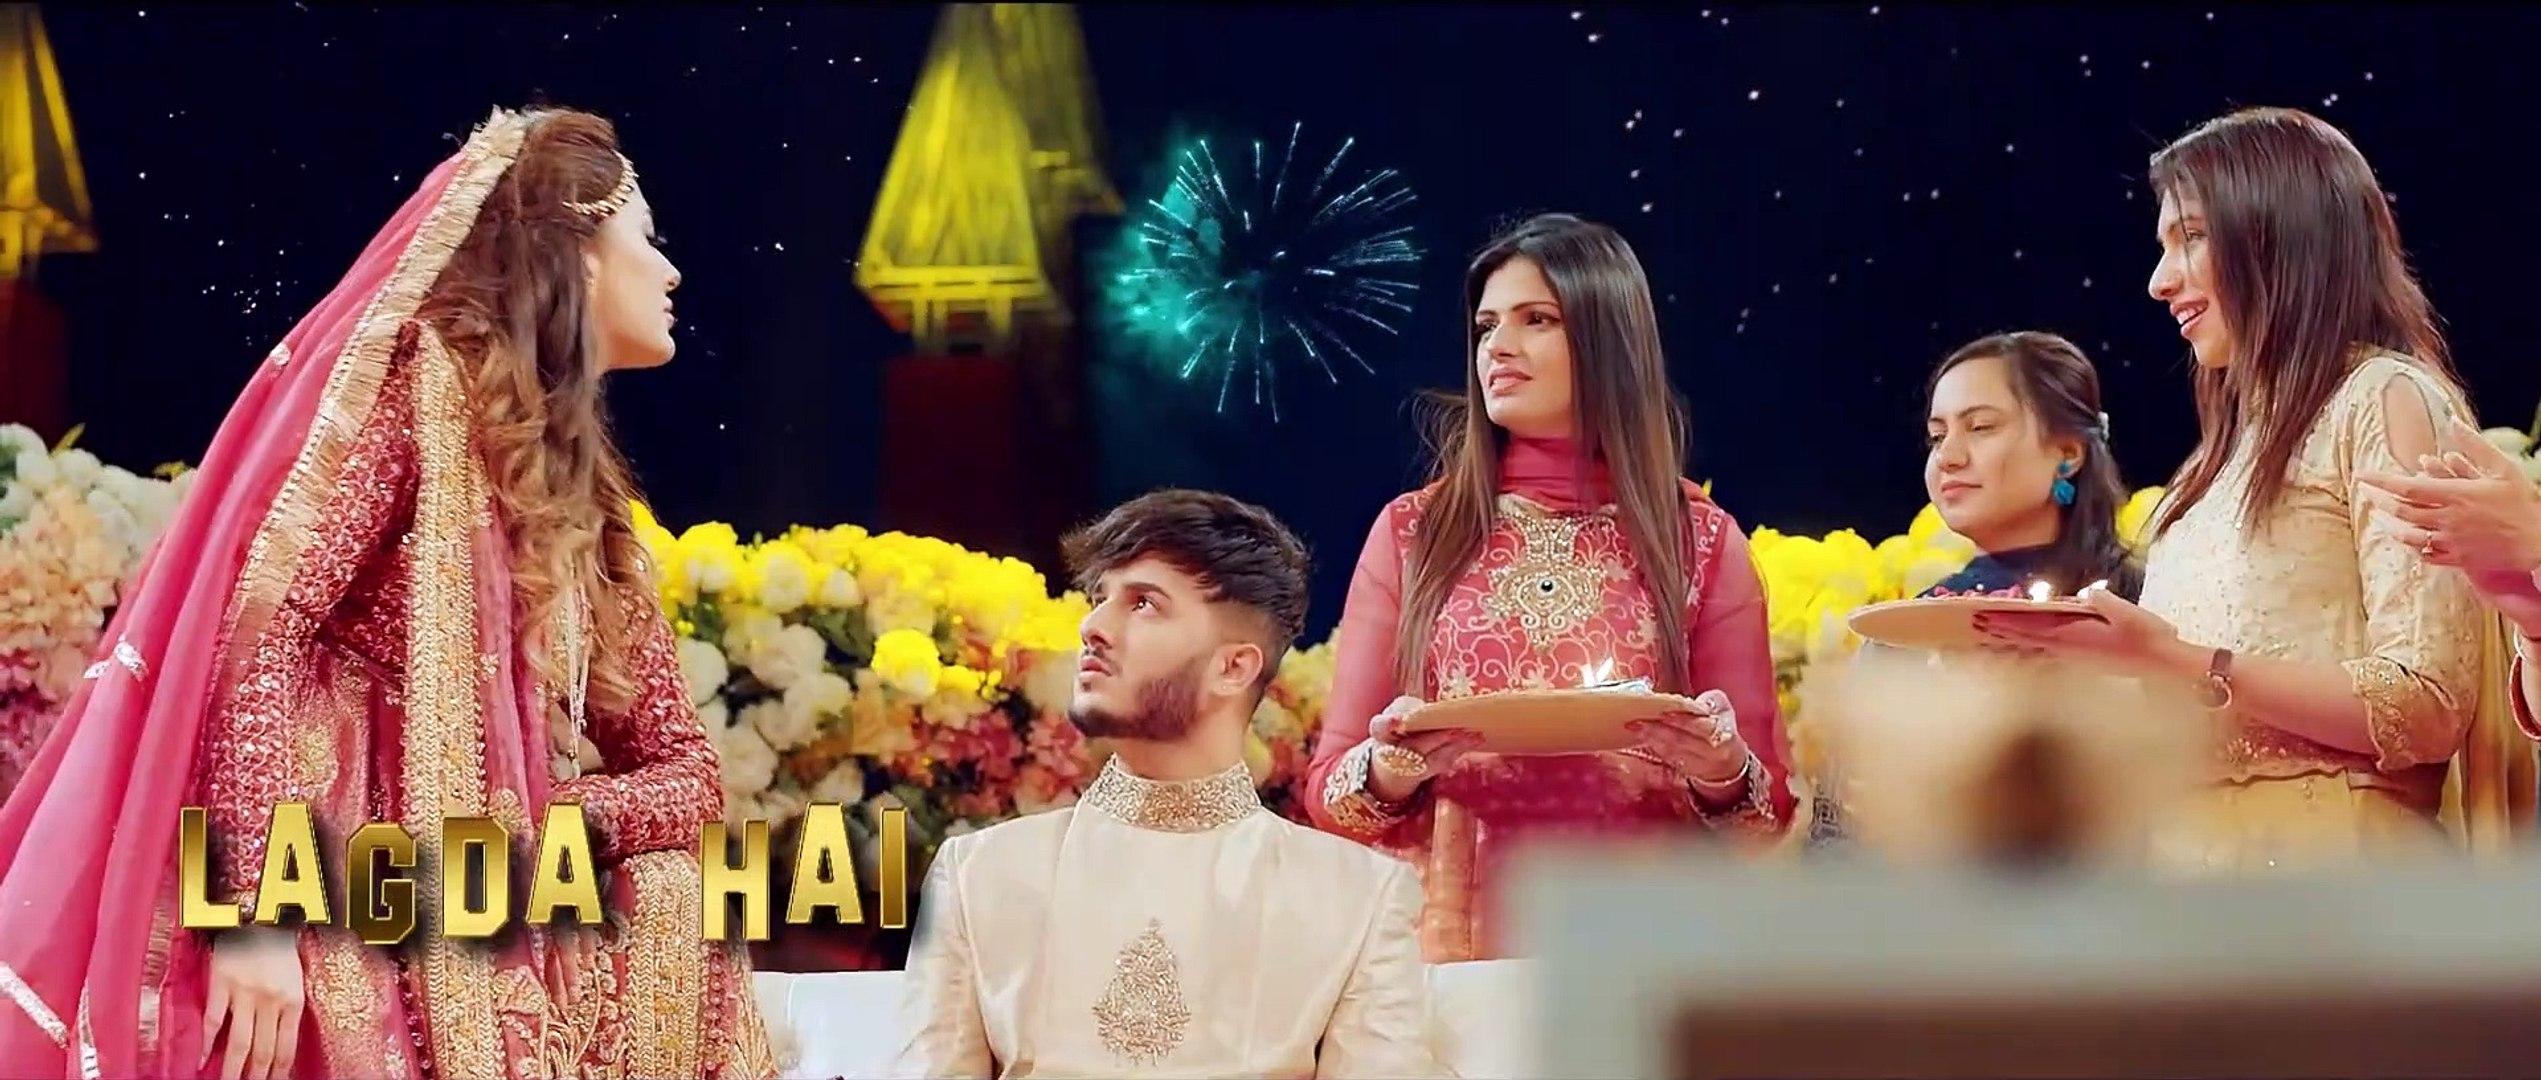 Chamkeeli - (Official Video) | Abrar Ul Haq | Latest Punjabi Song 2019 | Flixaap